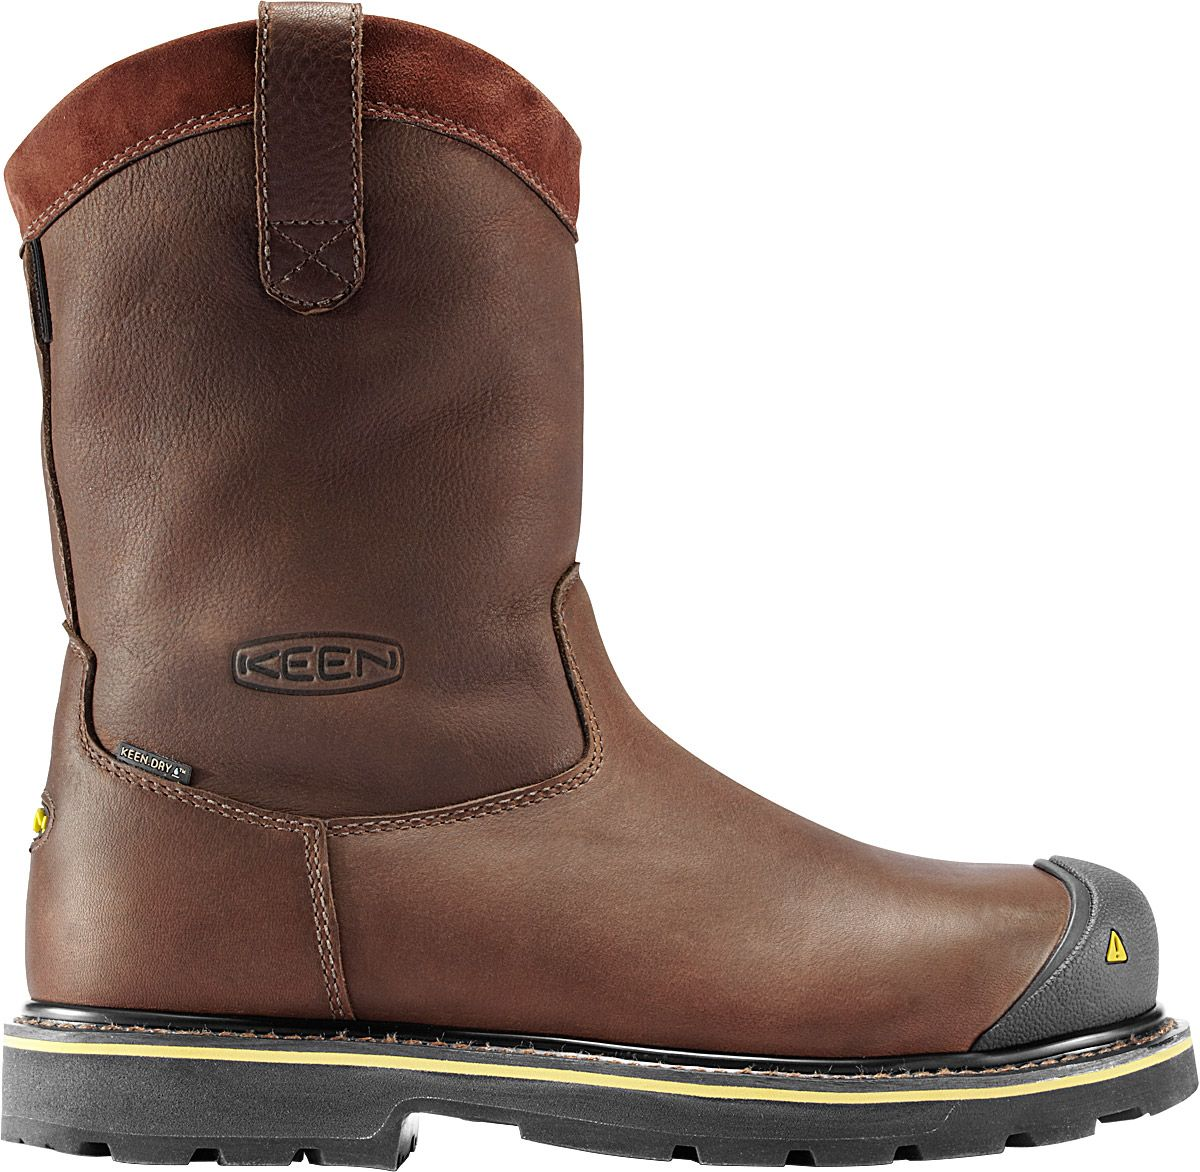 Waterproof Steel Toe Work Boots, Dark